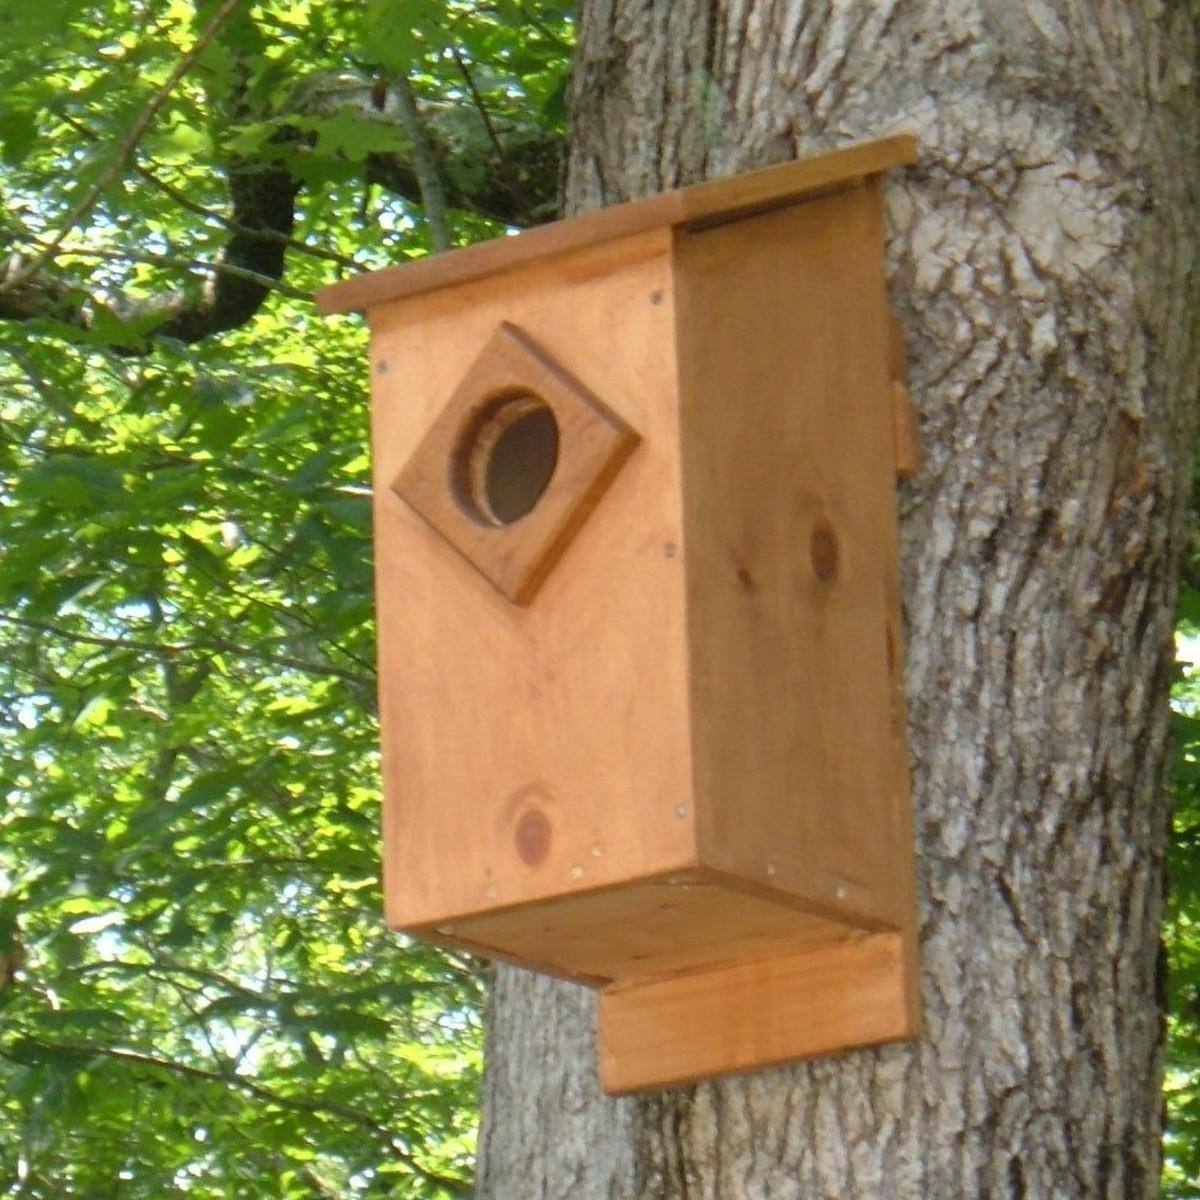 Owl Nest Box Plans